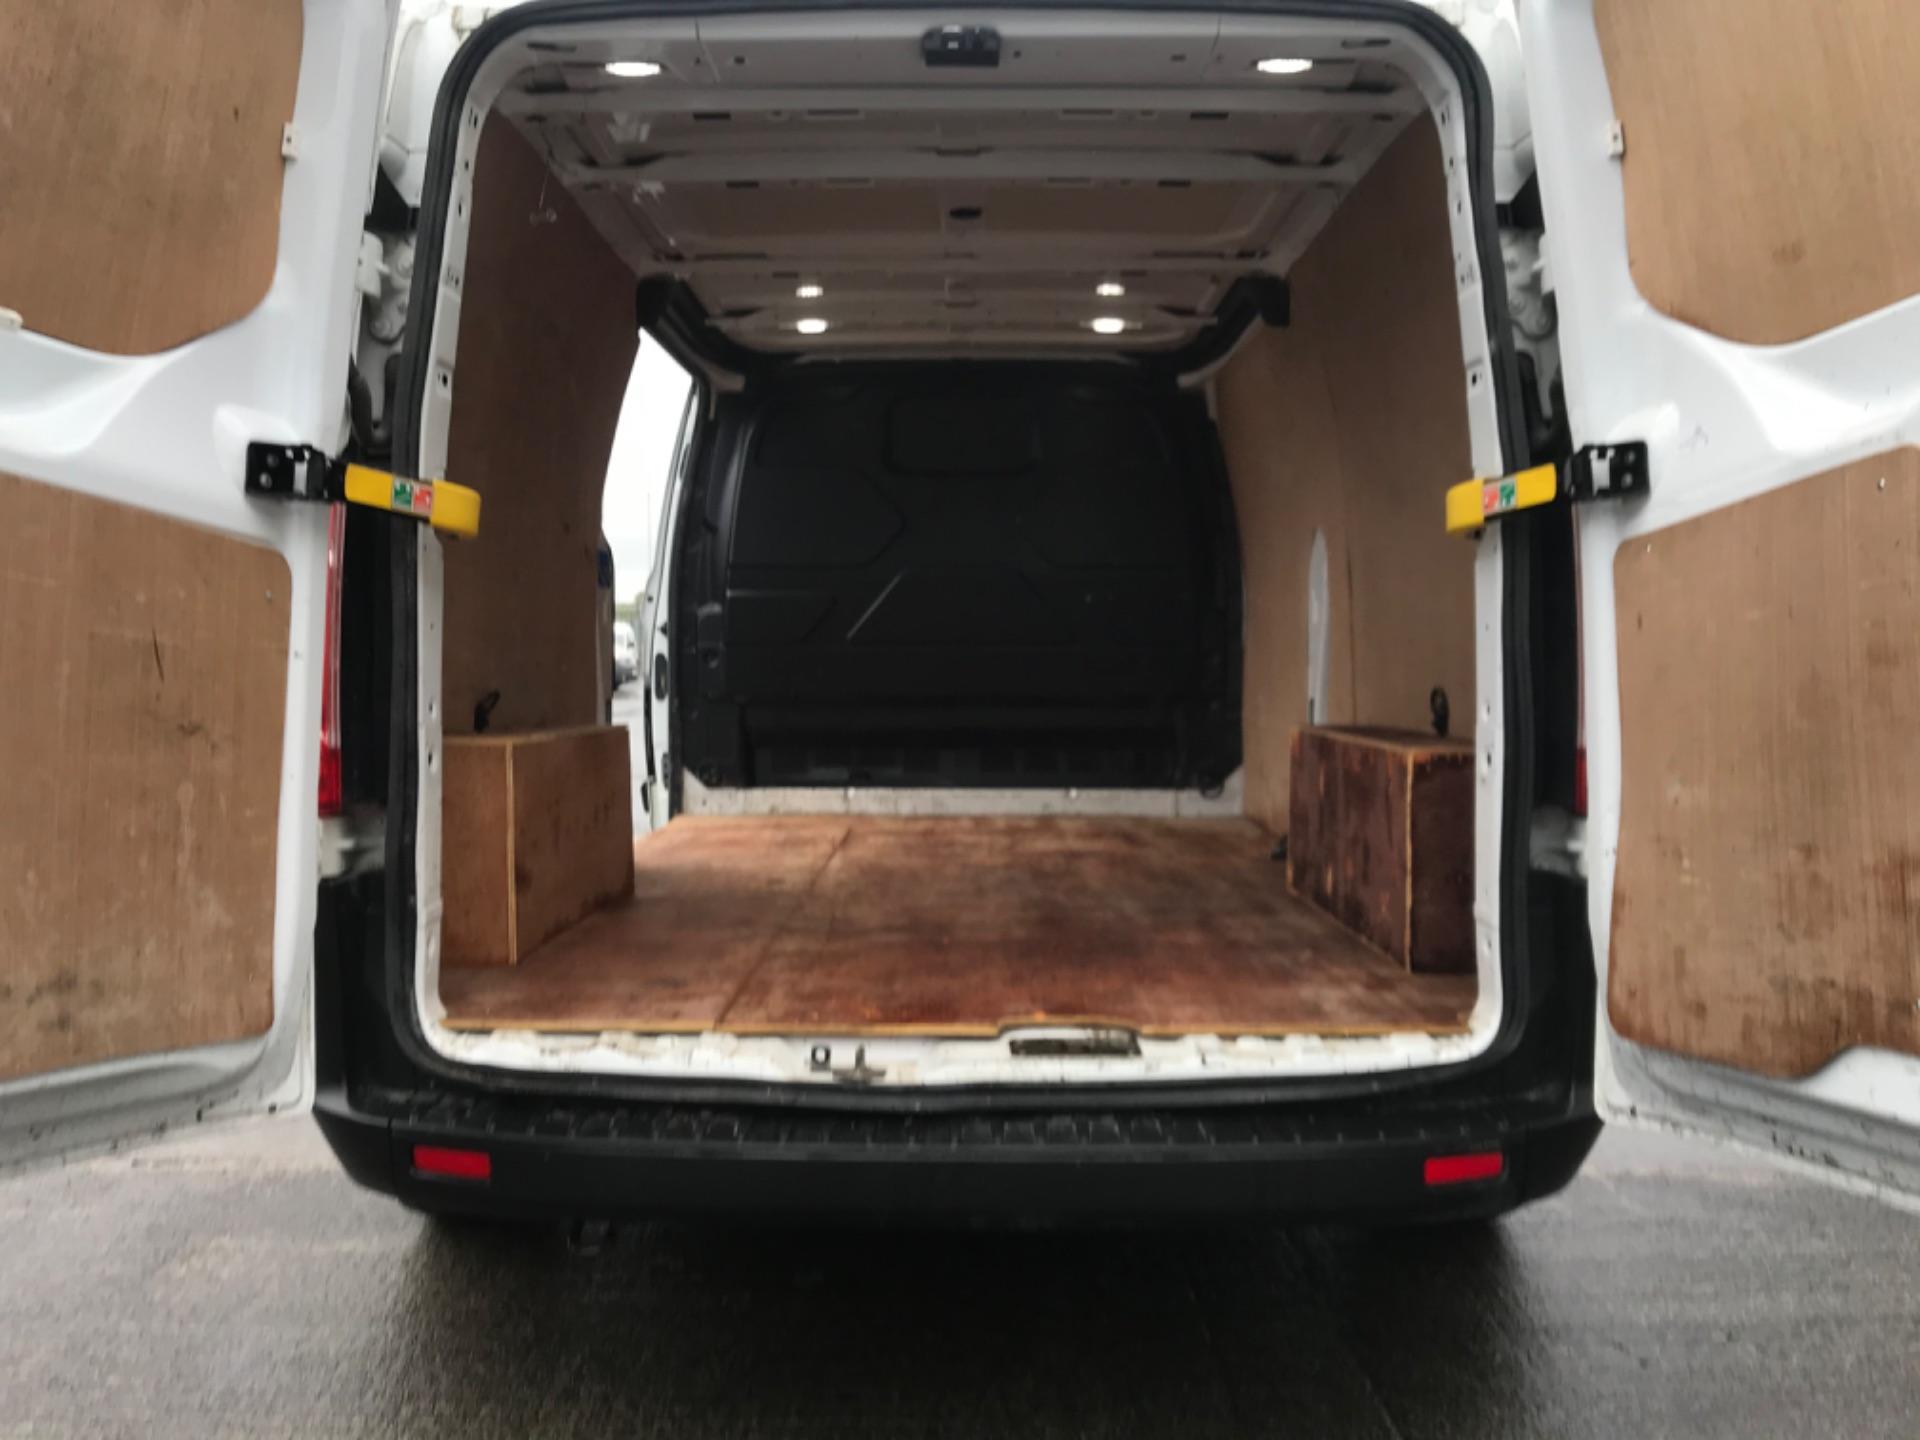 2018 Ford Transit Custom Custom 300 Lbase 2.0 105PS 3DR (181D27029) Image 9